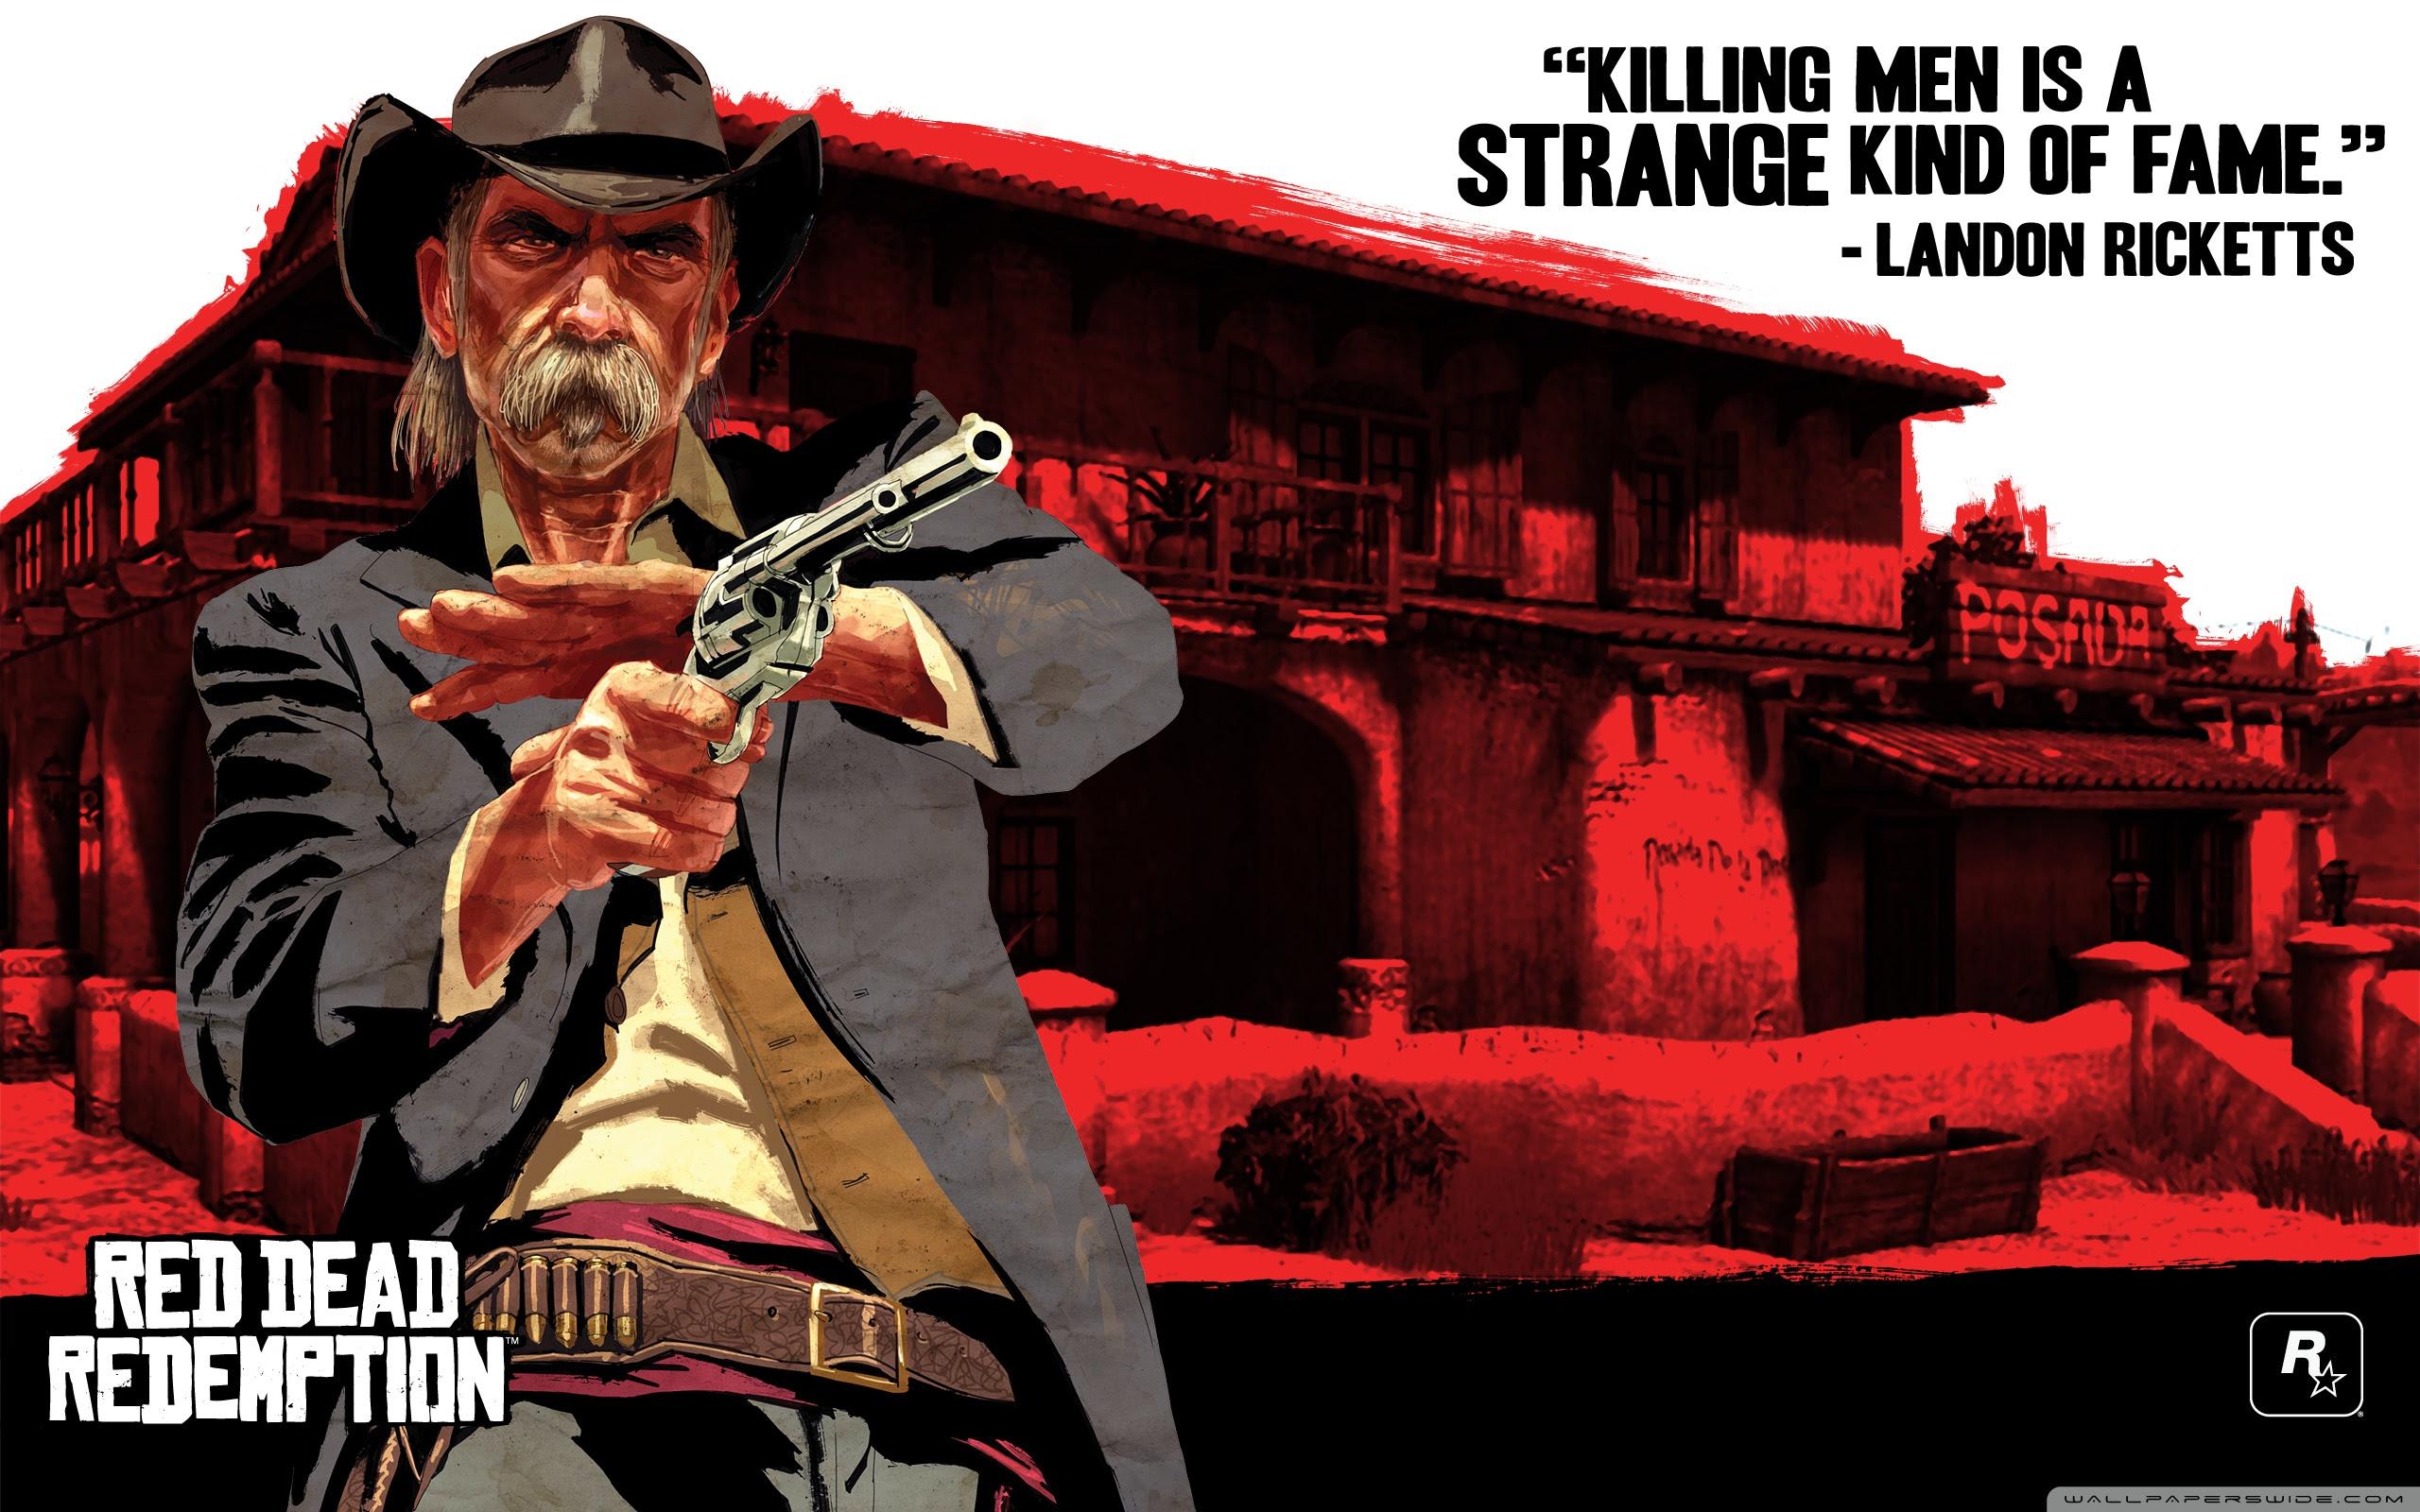 Red Dead Redemption Wallpaper 2560x1600 79062